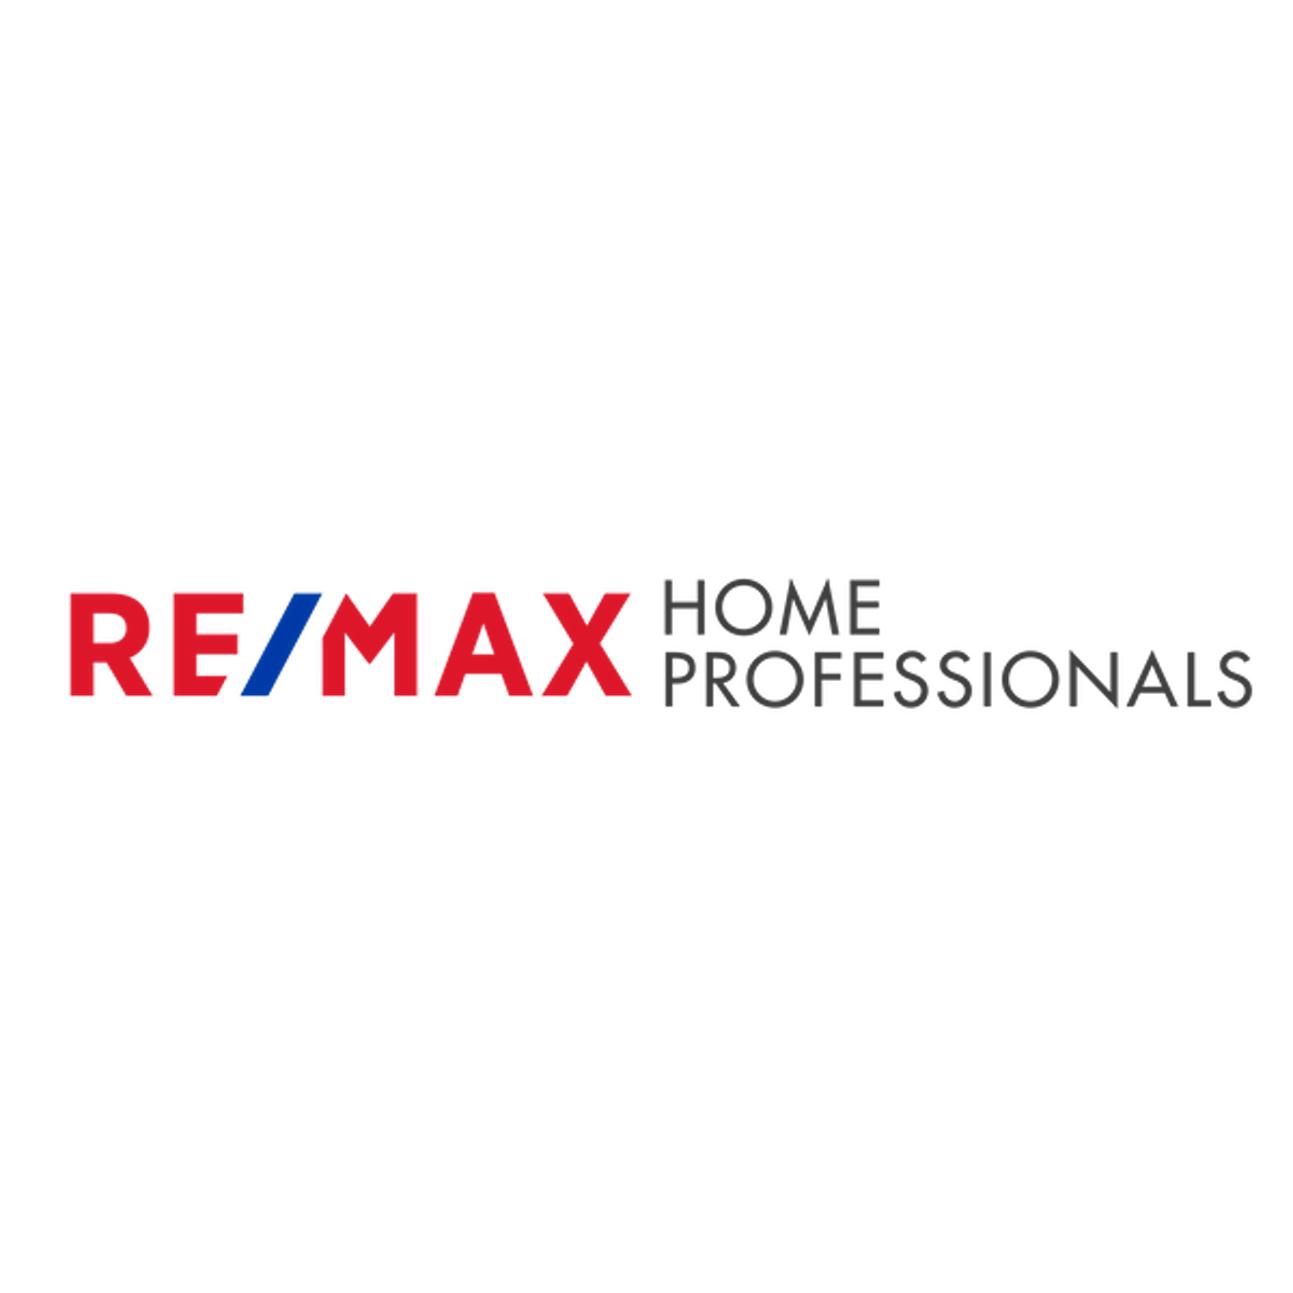 Jewel Carter | RE/MAX Home Professionals